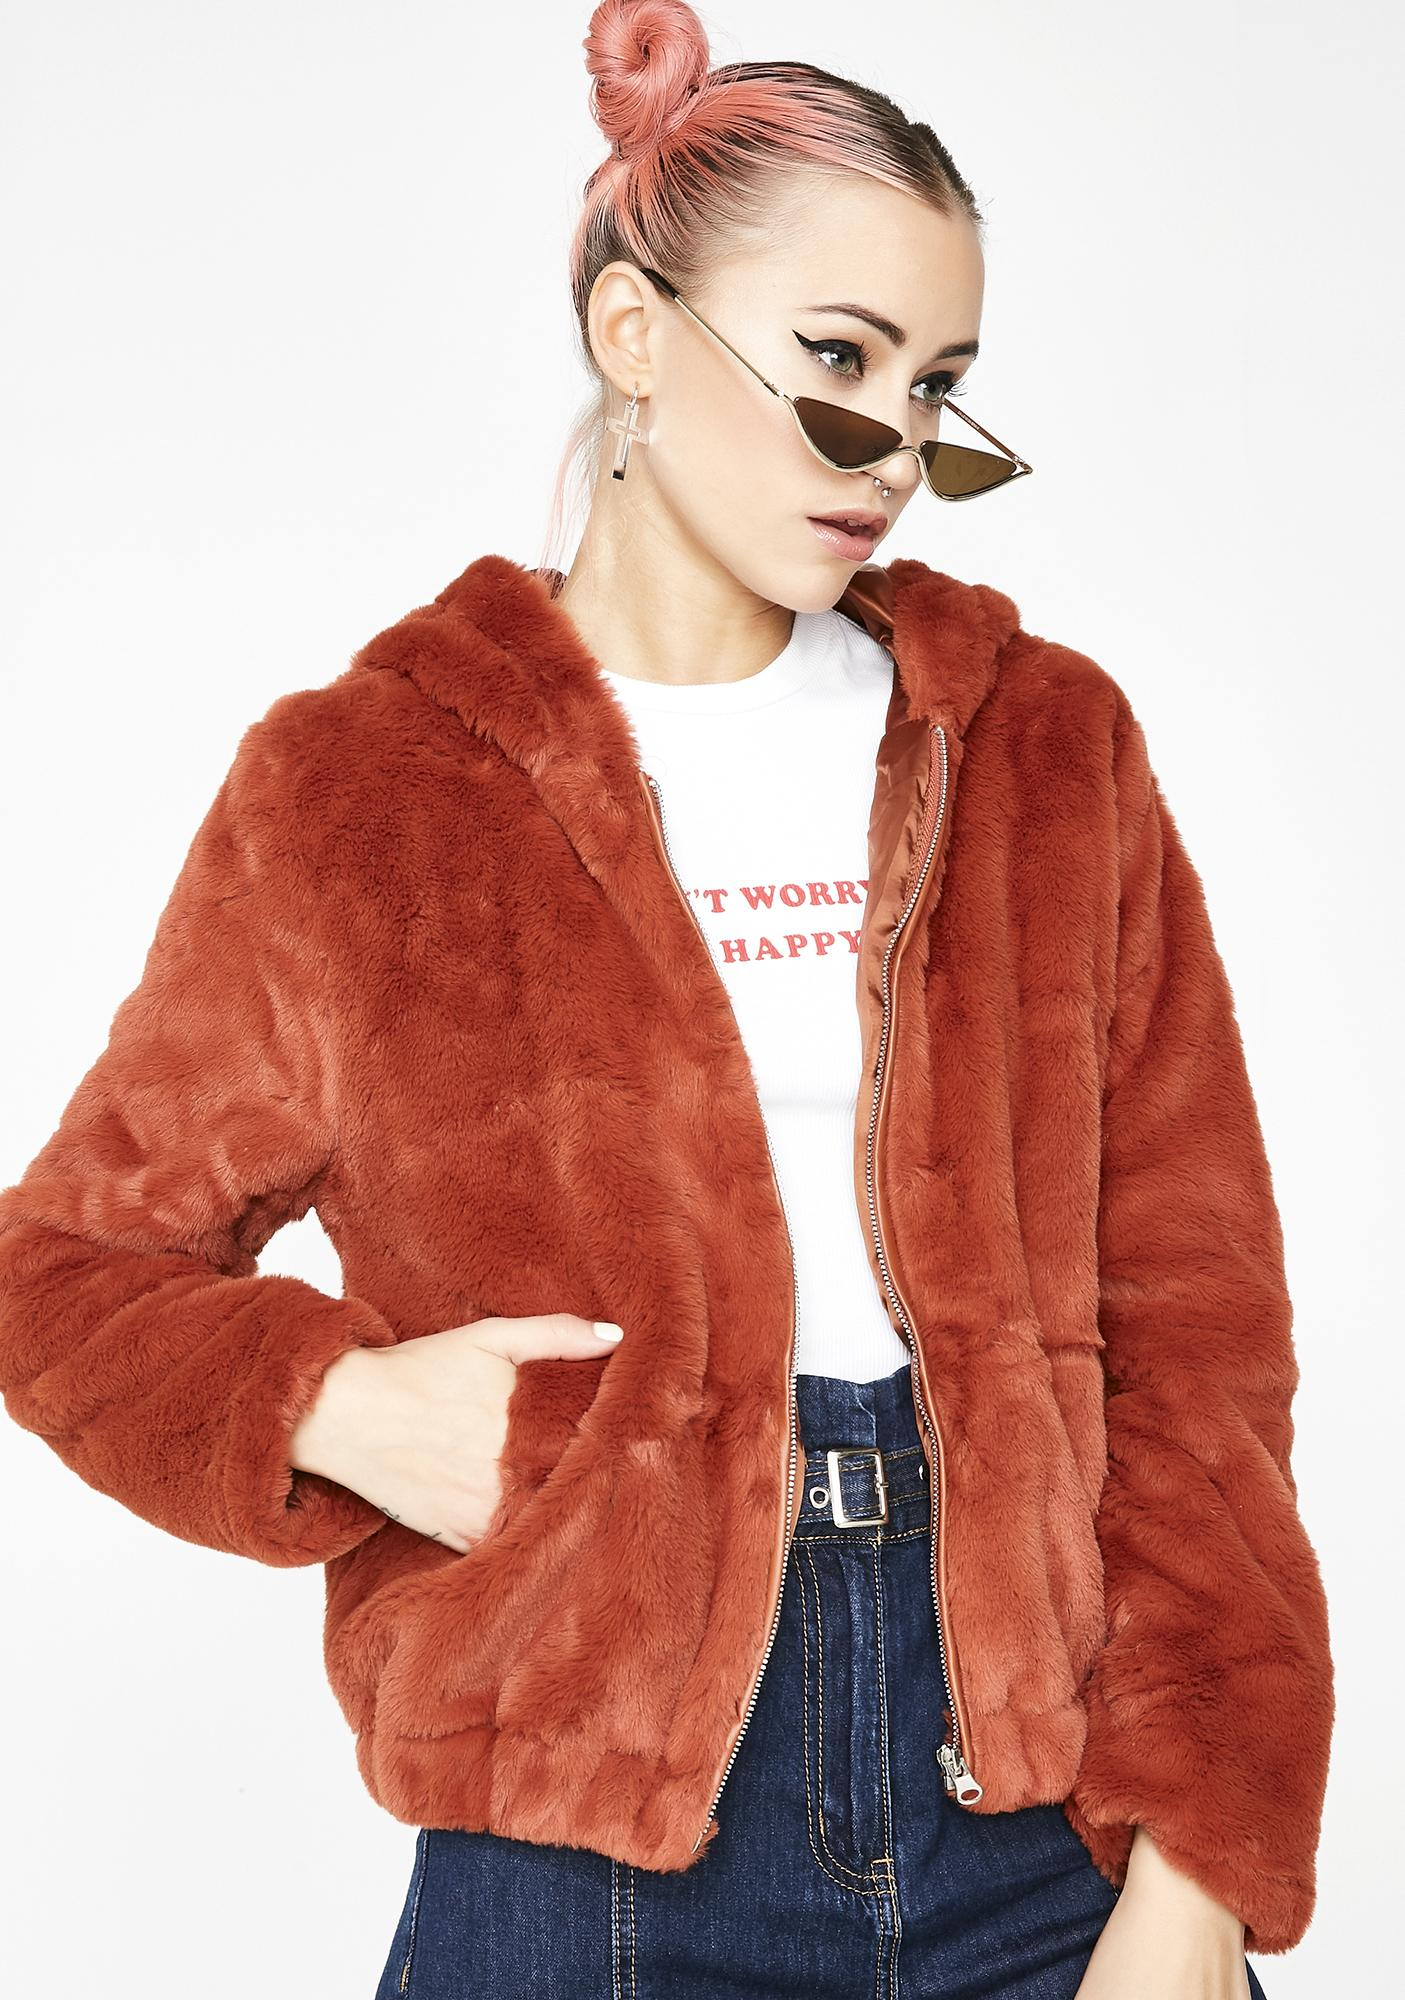 Rust Cuddle Buddy Fuzzy Jacket